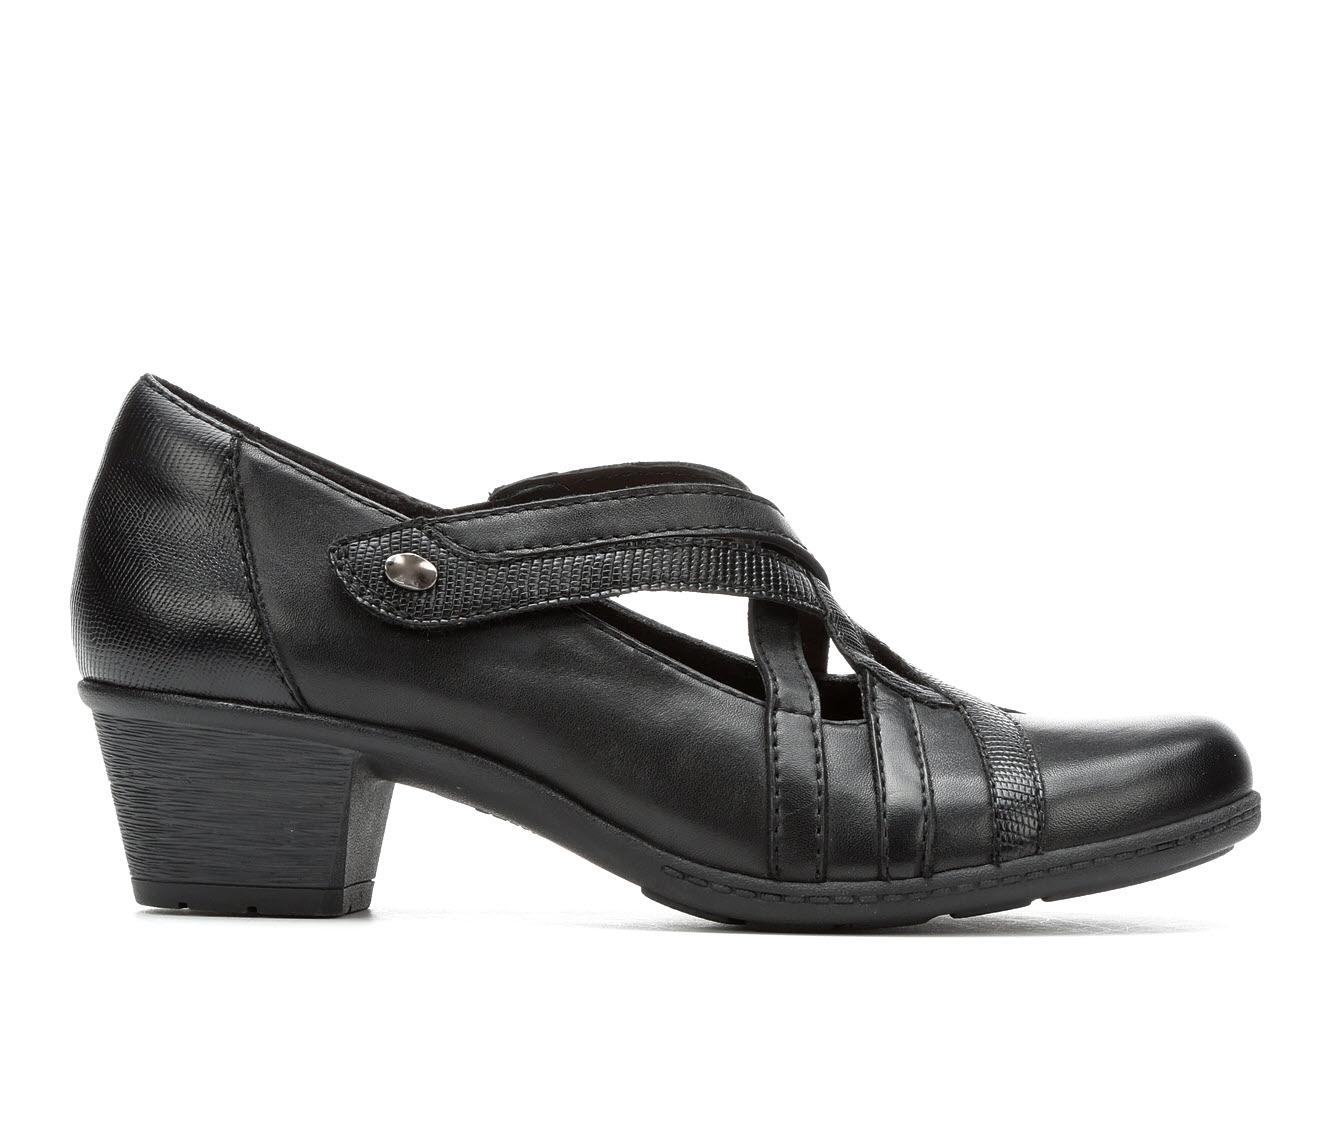 Earth Origins Macey Women's Shoe (Black Leather)